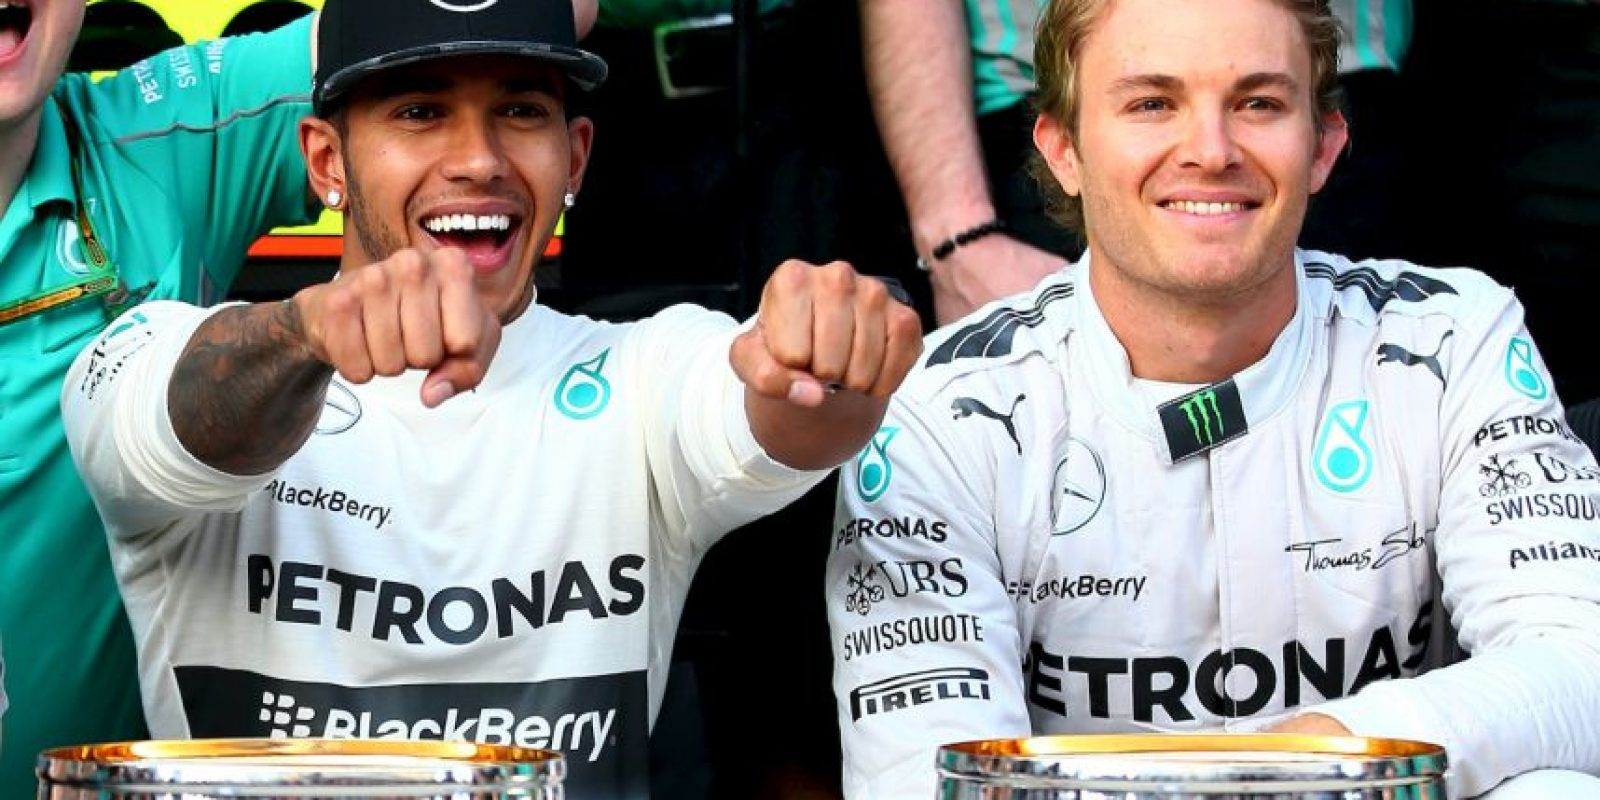 Lewis Hamilton vs. Nico Rosberg Foto:Getty Images